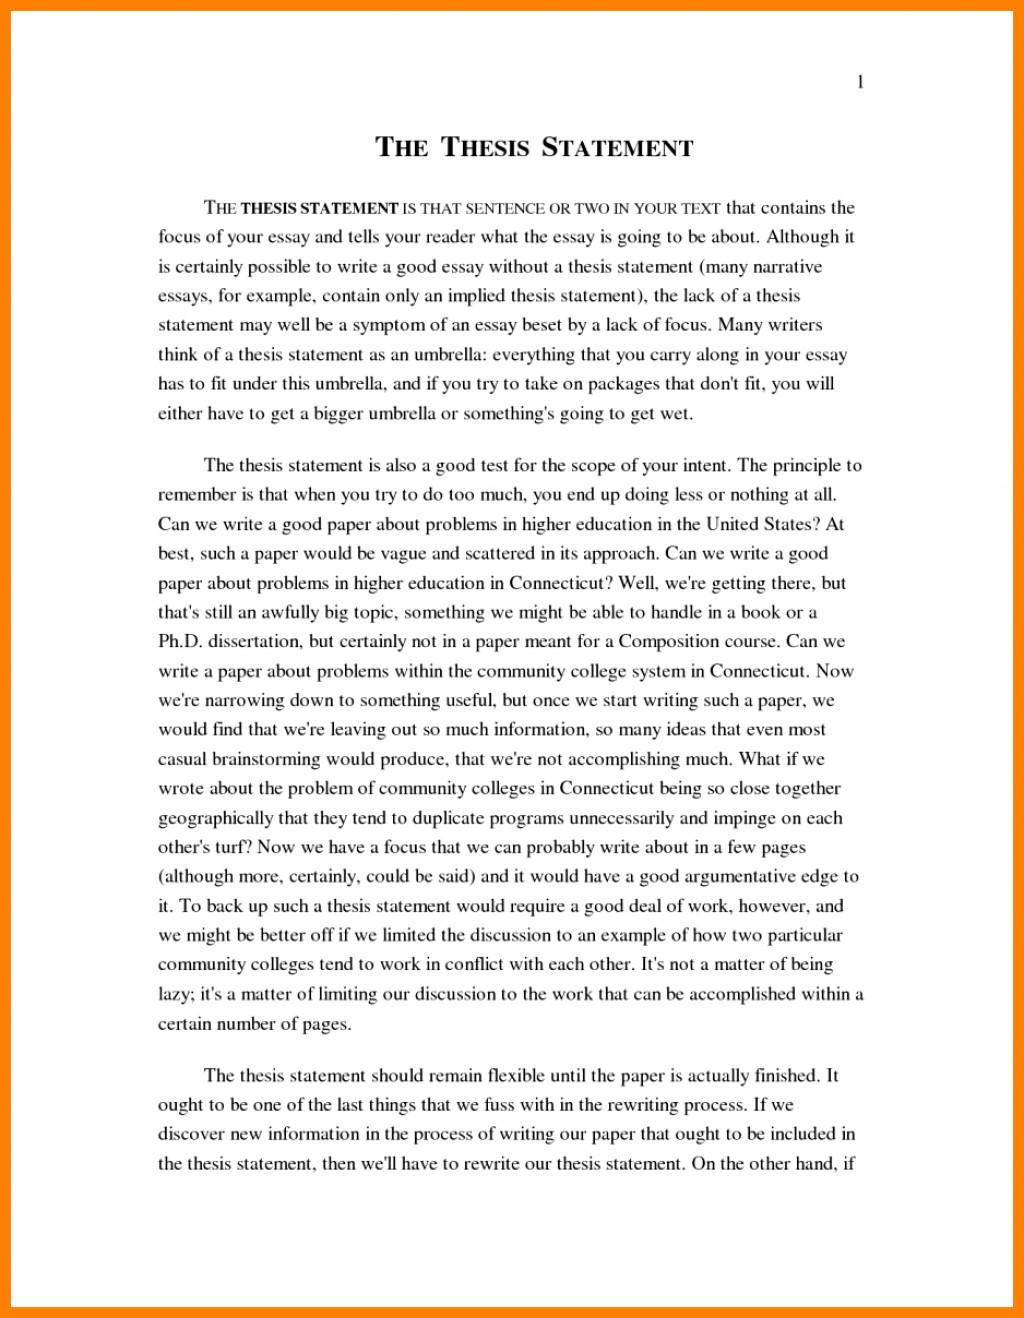 006 Personal Narrative Essay Example High School Examp